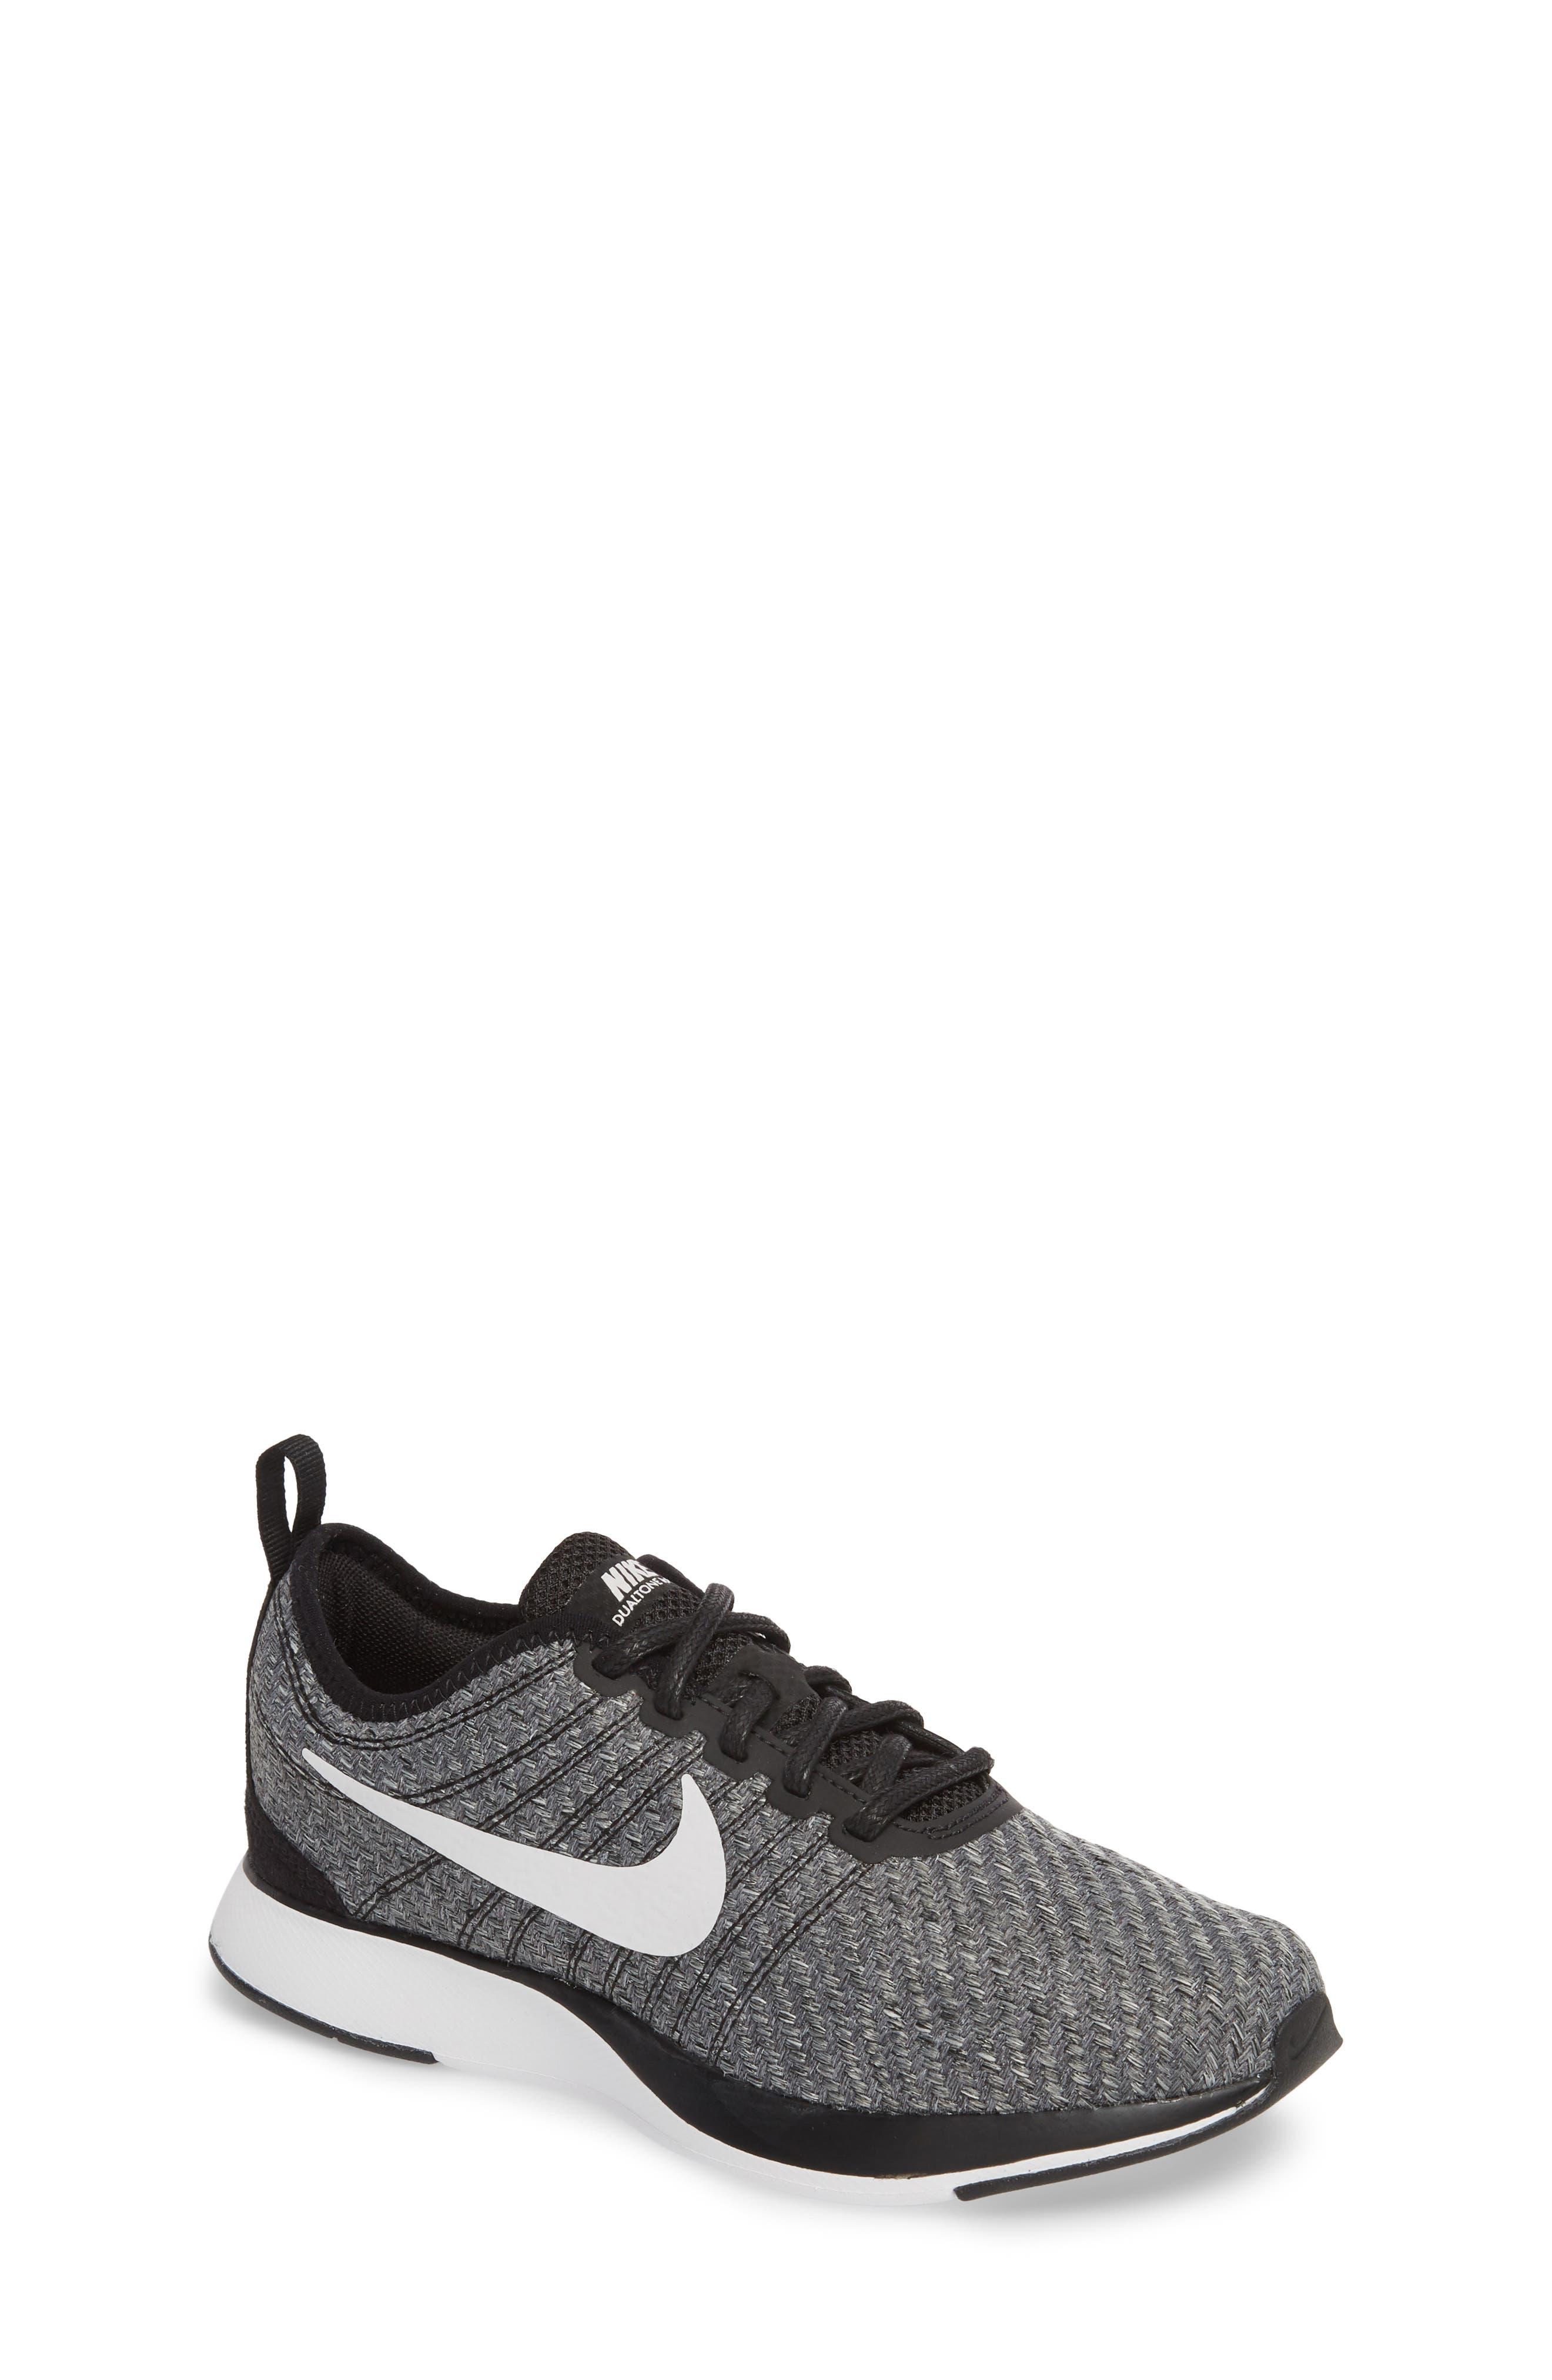 Nike | Dualtone Racer SE Sneaker